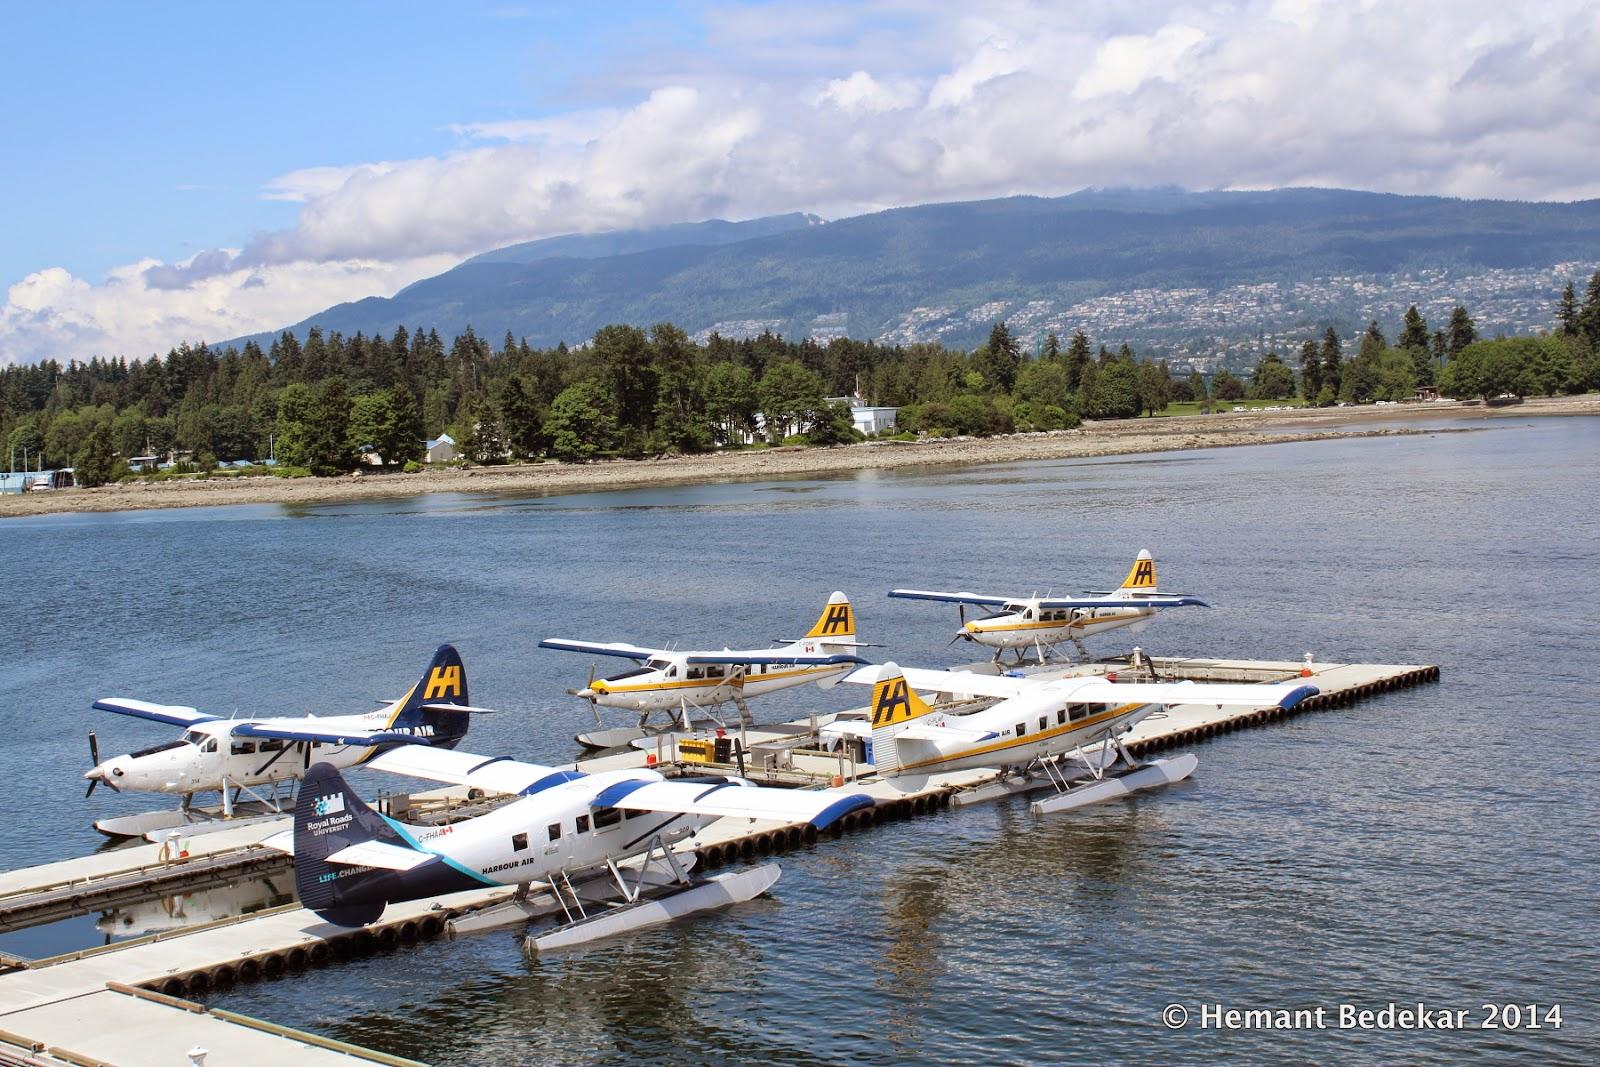 Sea planes in Coal Harbour